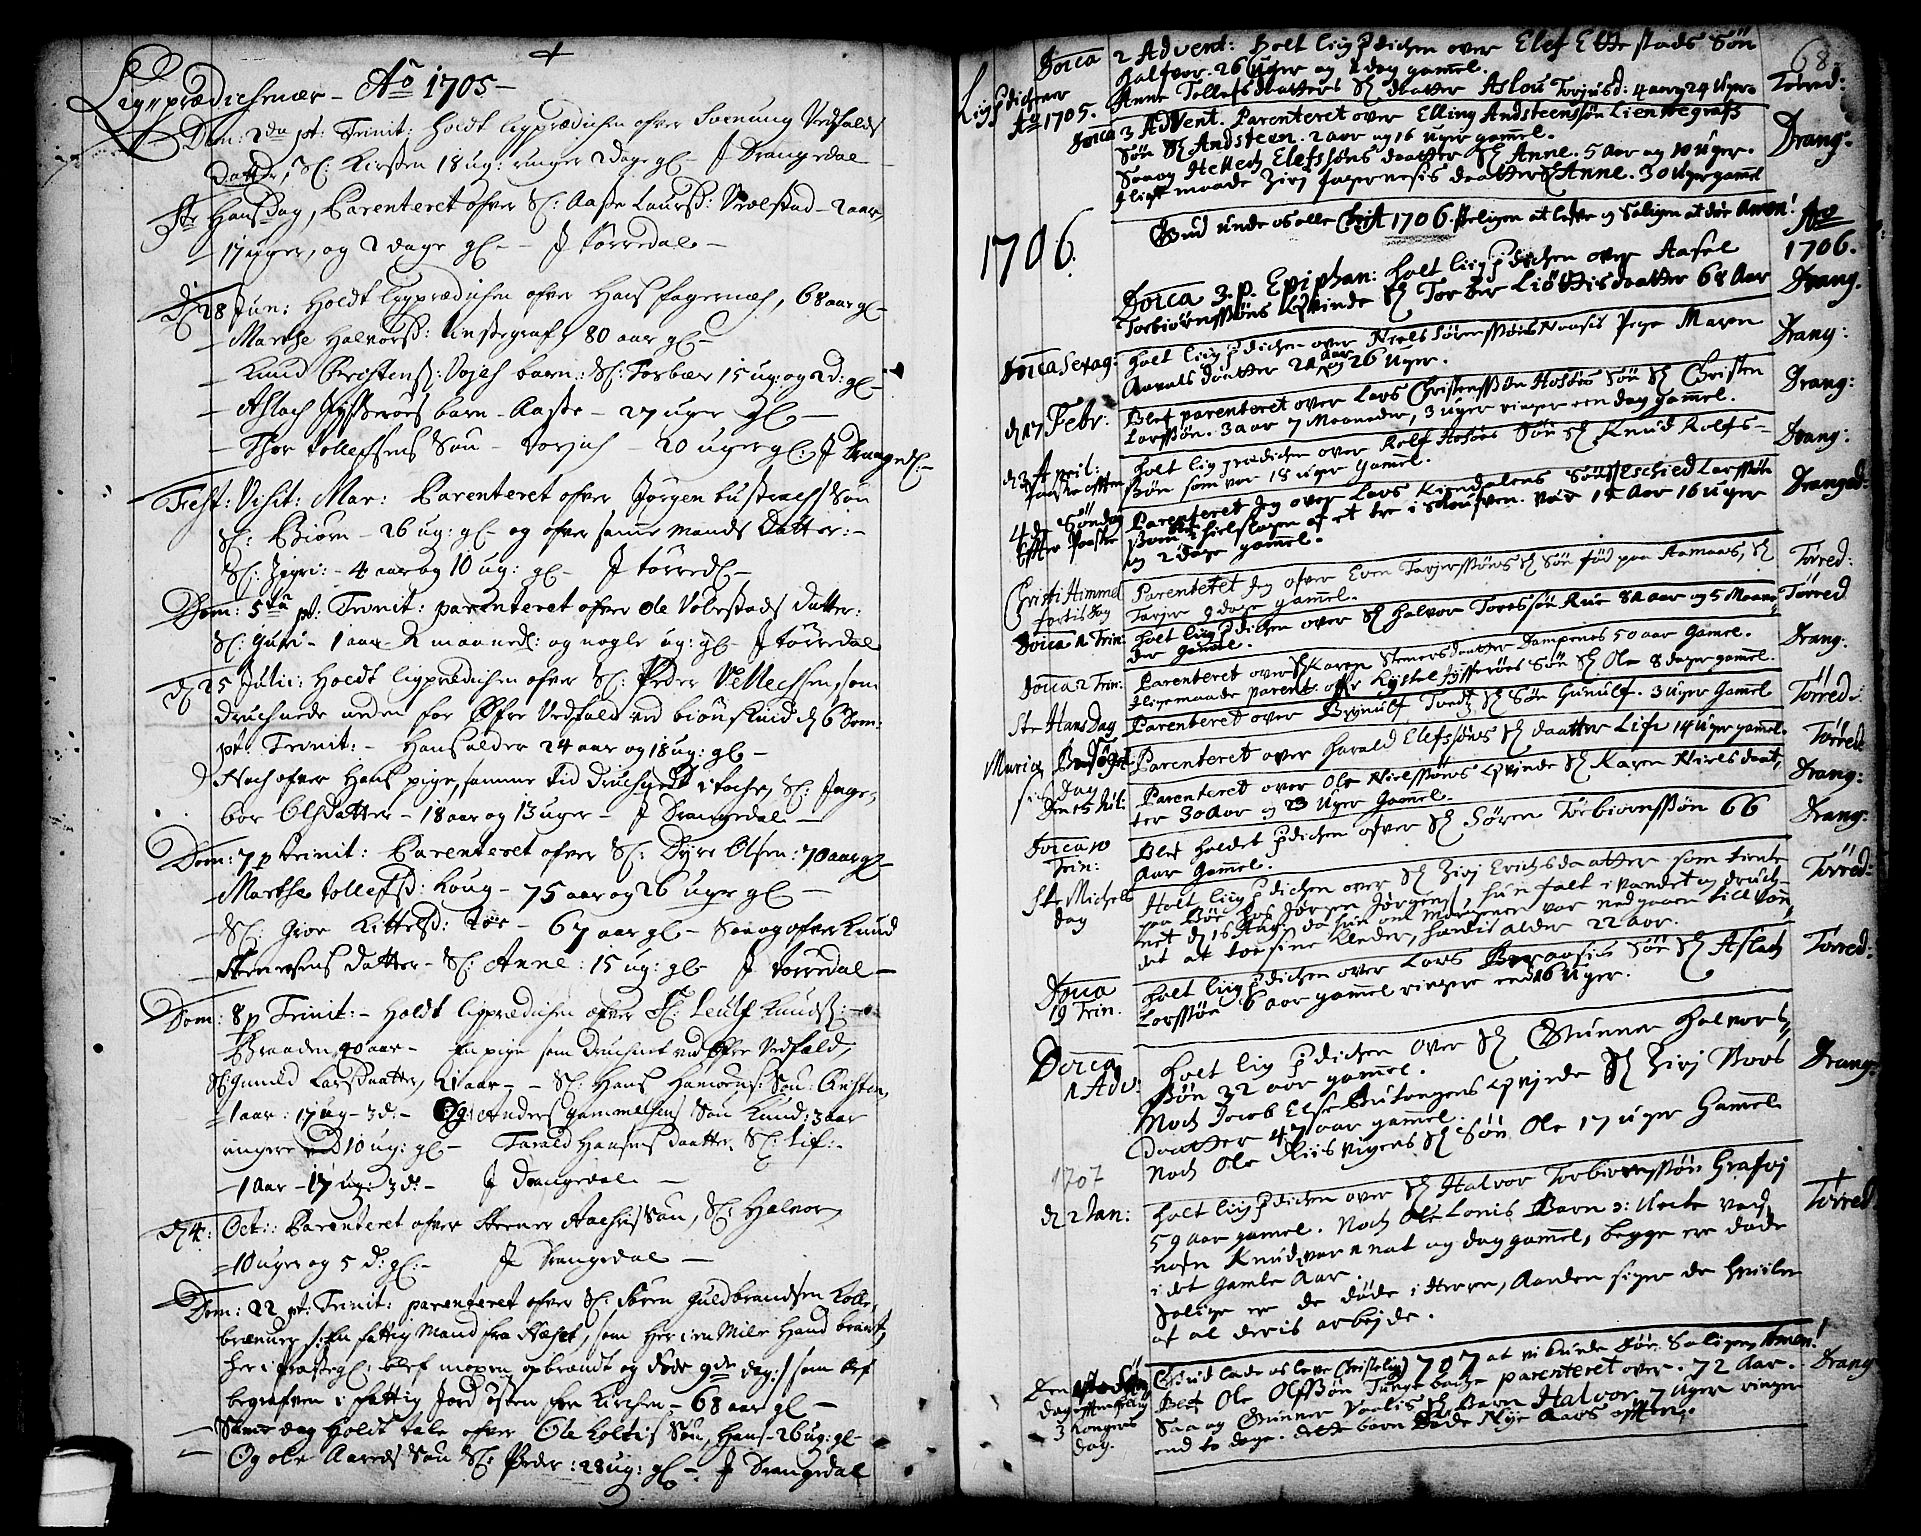 SAKO, Drangedal kirkebøker, F/Fa/L0001: Ministerialbok nr. 1, 1697-1767, s. 68